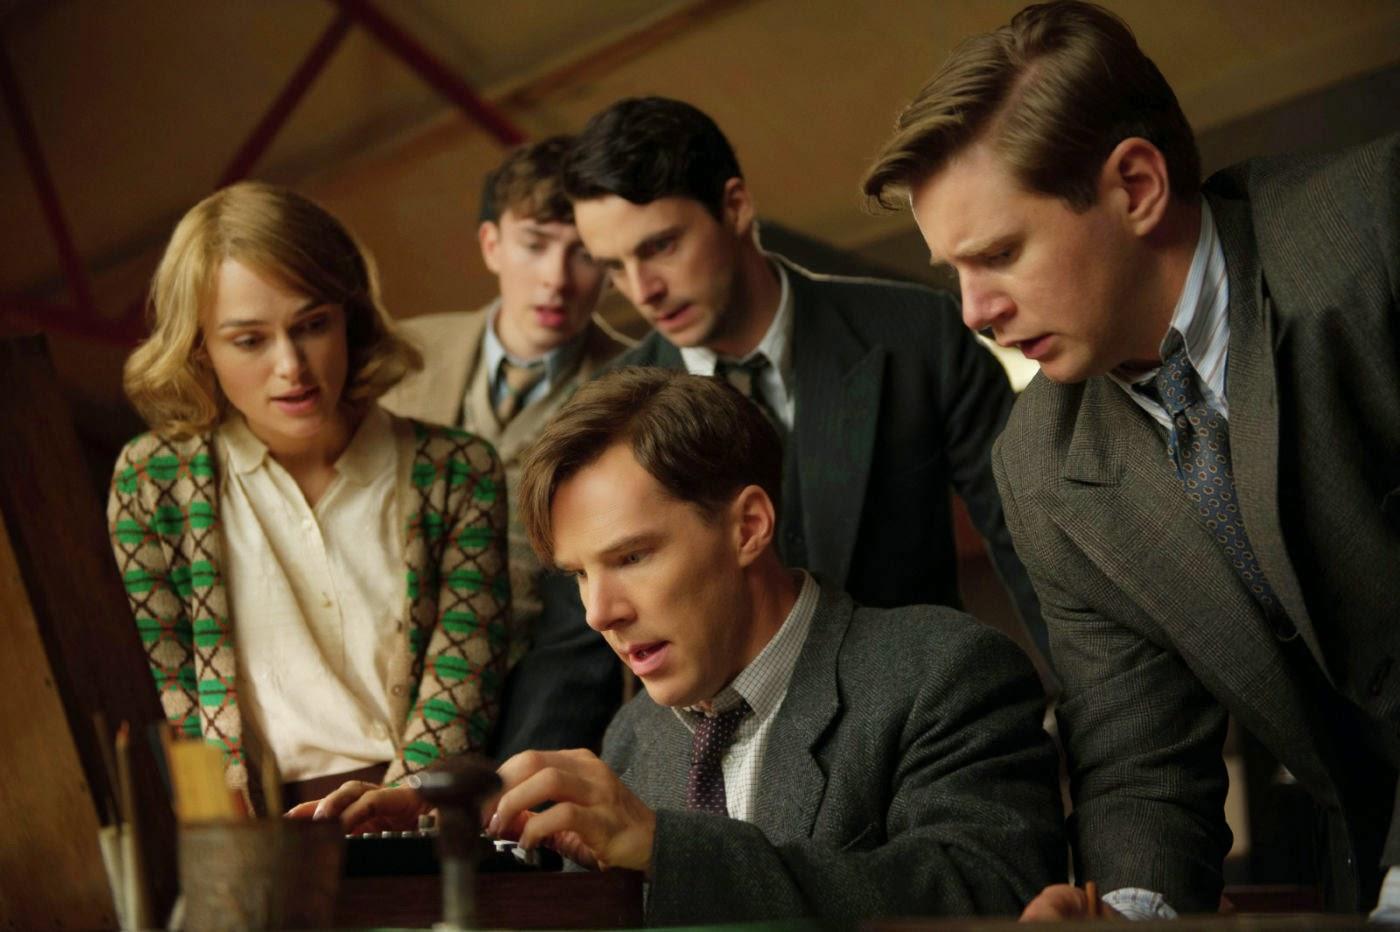 Keira Knightley, Matthew Beard, Matthew Goode, Allen Leech, and Benedict Cumberbatch in The Imitation Game